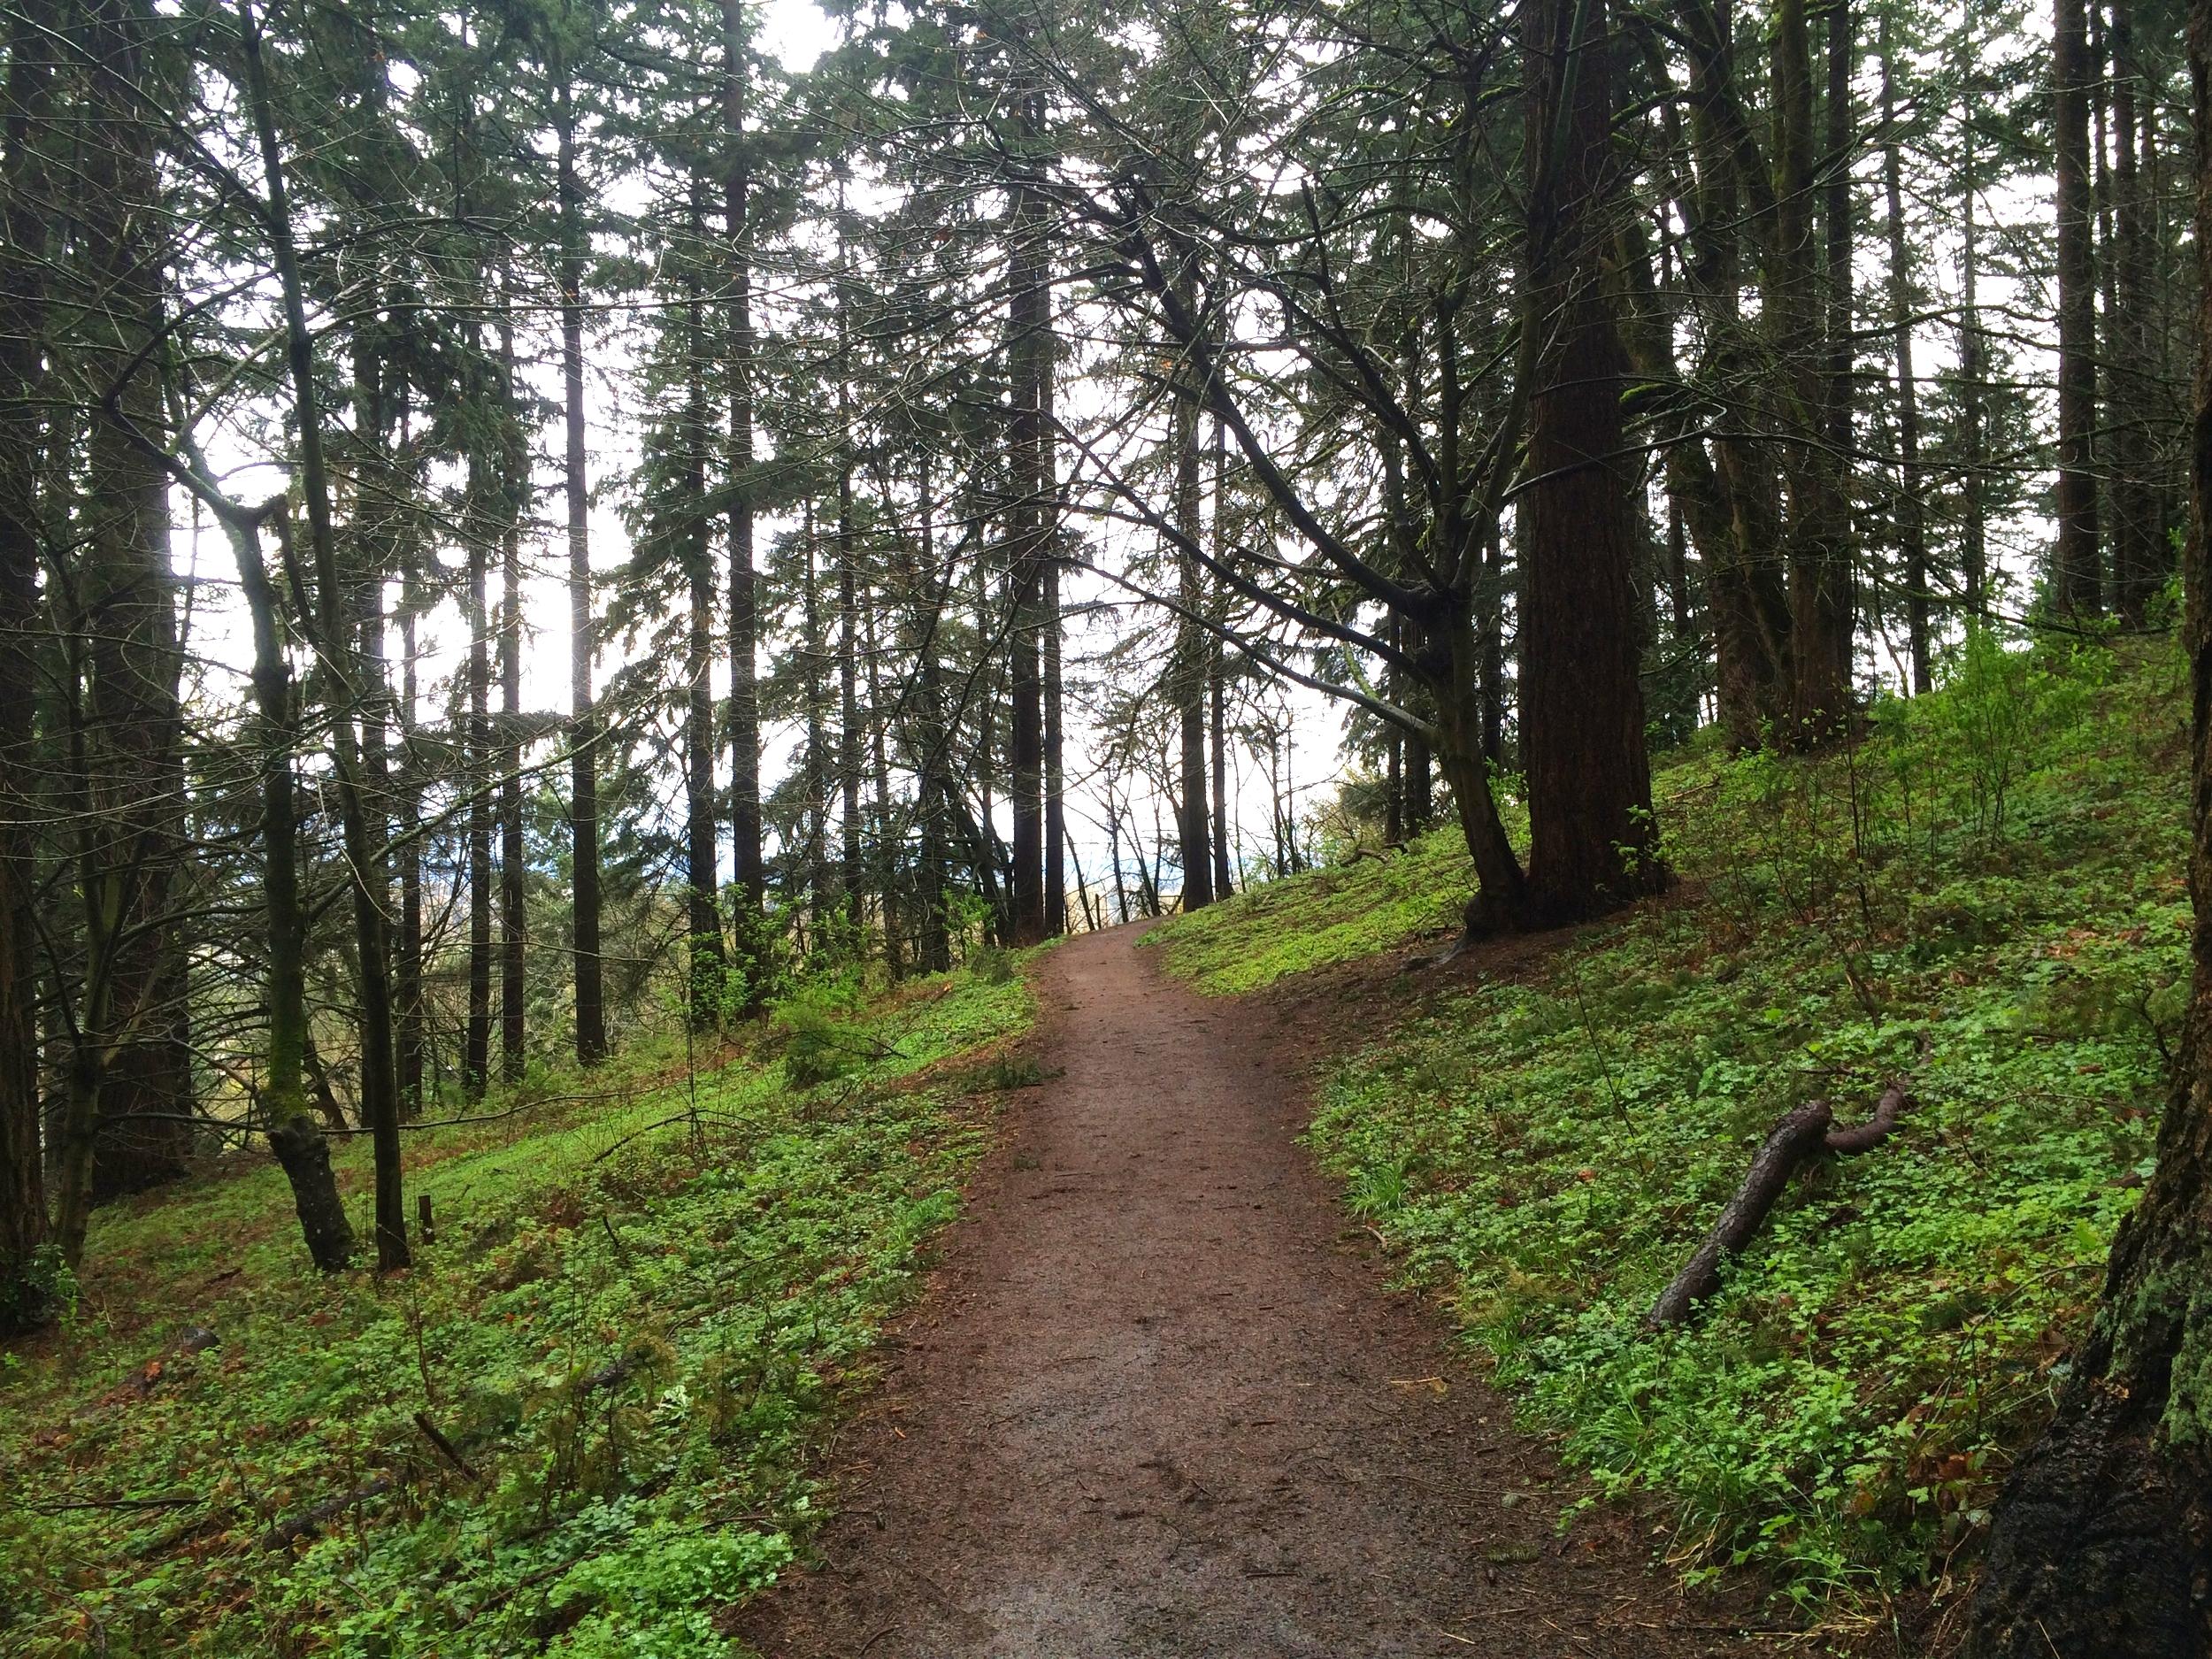 A path on Mt. Tabor.